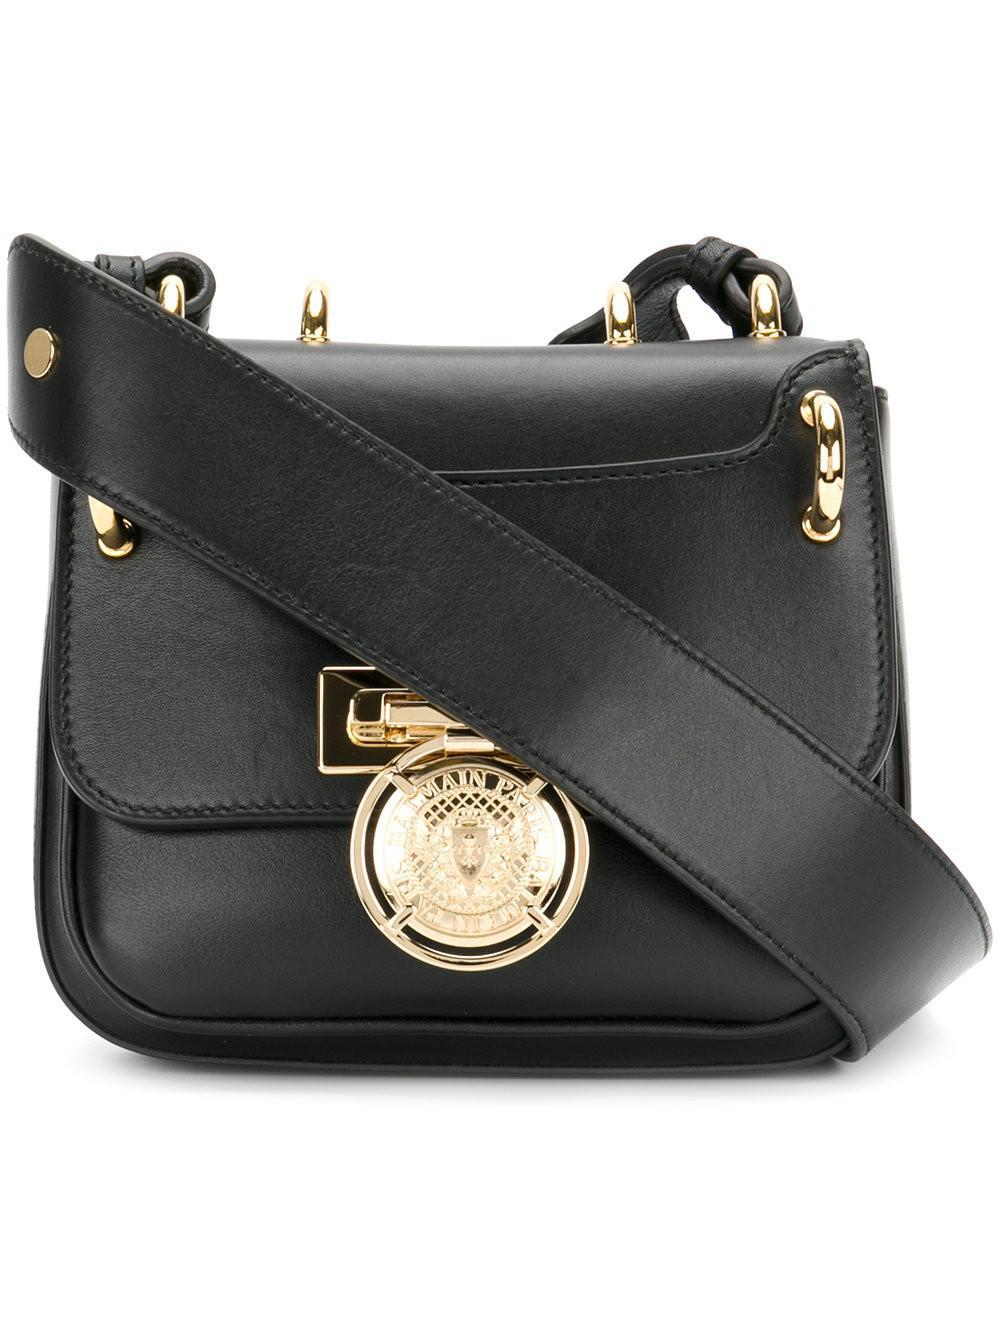 9ee8a95ba4 Lyst - Balmain Renaissance 18 Crossbody Bag in Black